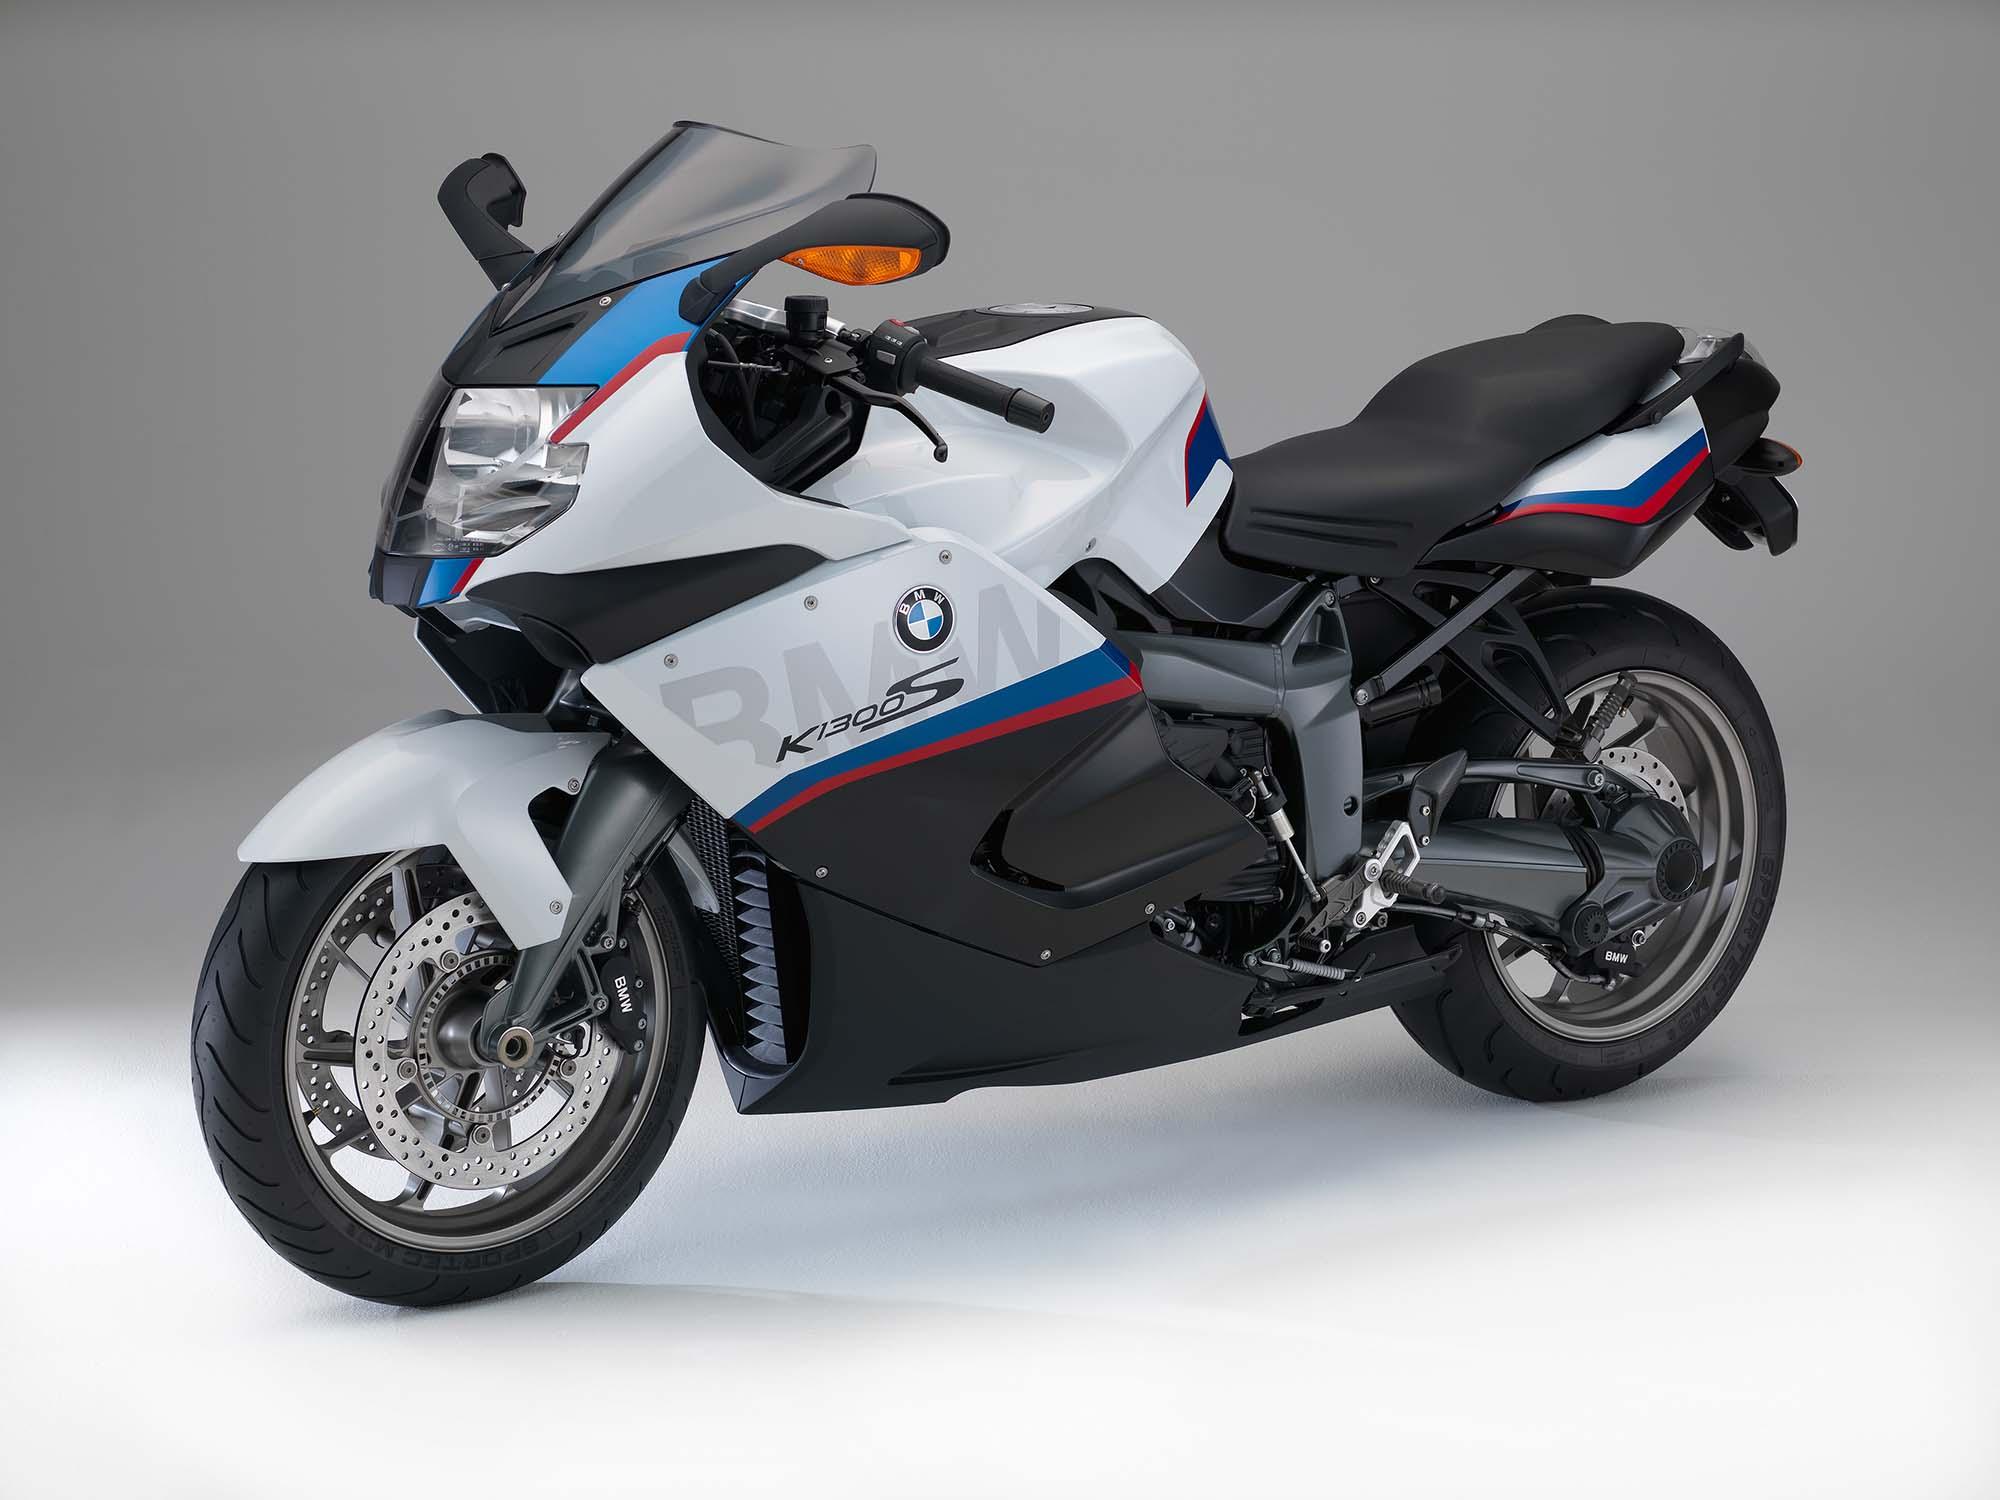 http://i0.wp.com/www.asphaltandrubber.com/wp-content/uploads/2014/07/2015-BMW-K1300S-02.jpg